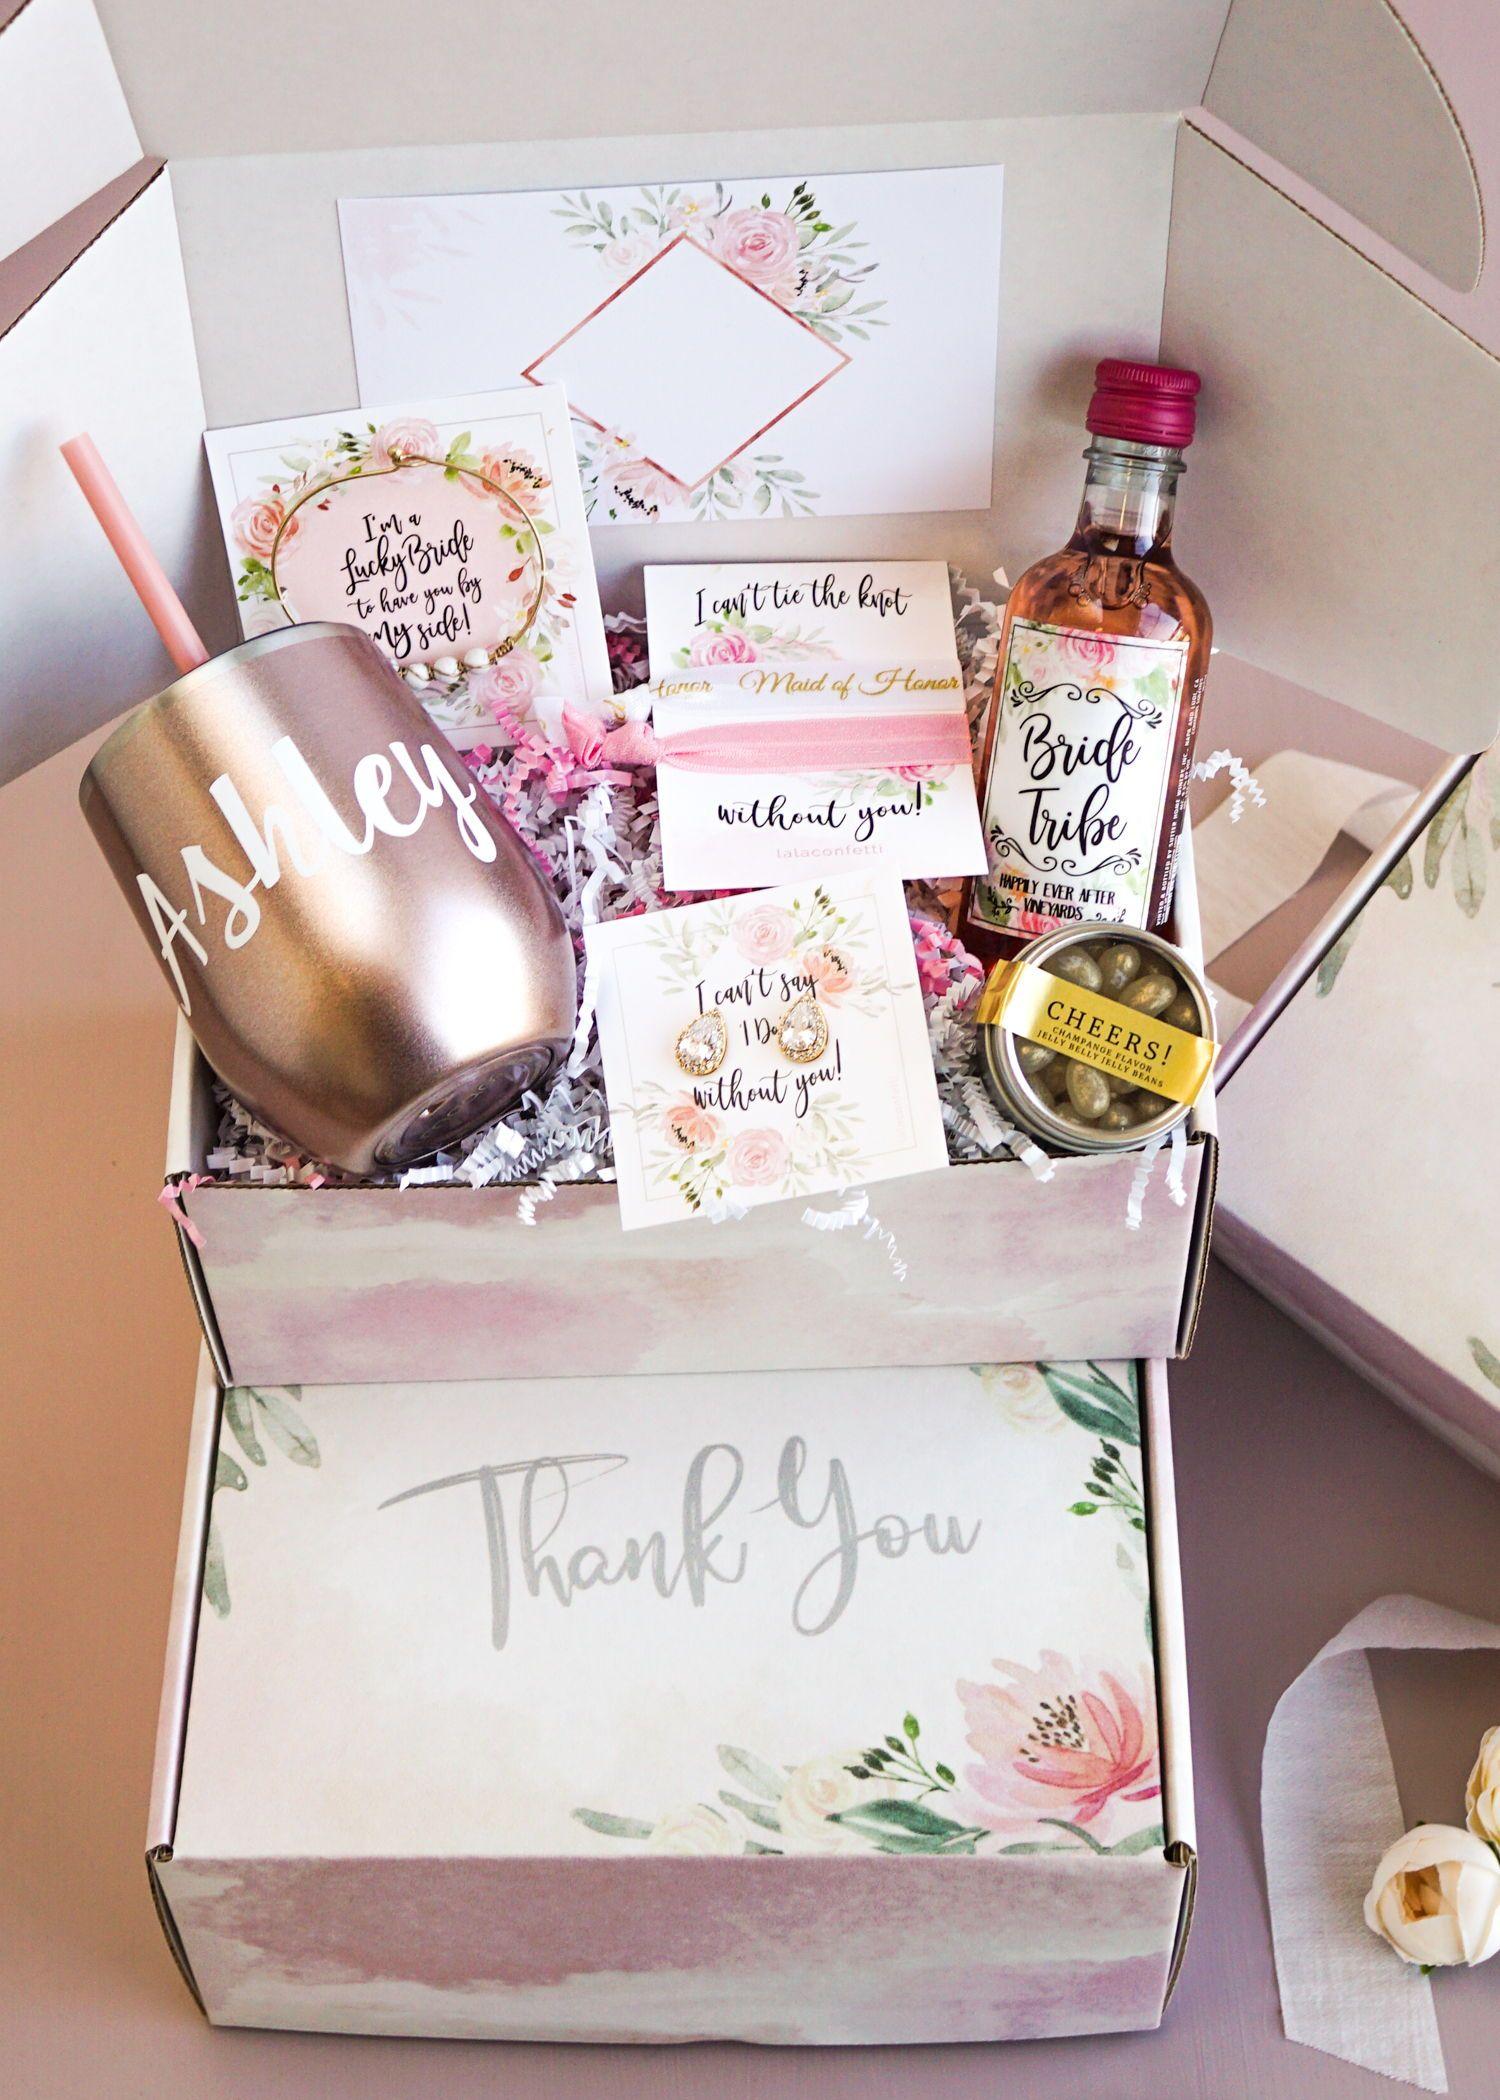 Bridesmaid thank you box original edition gifts for